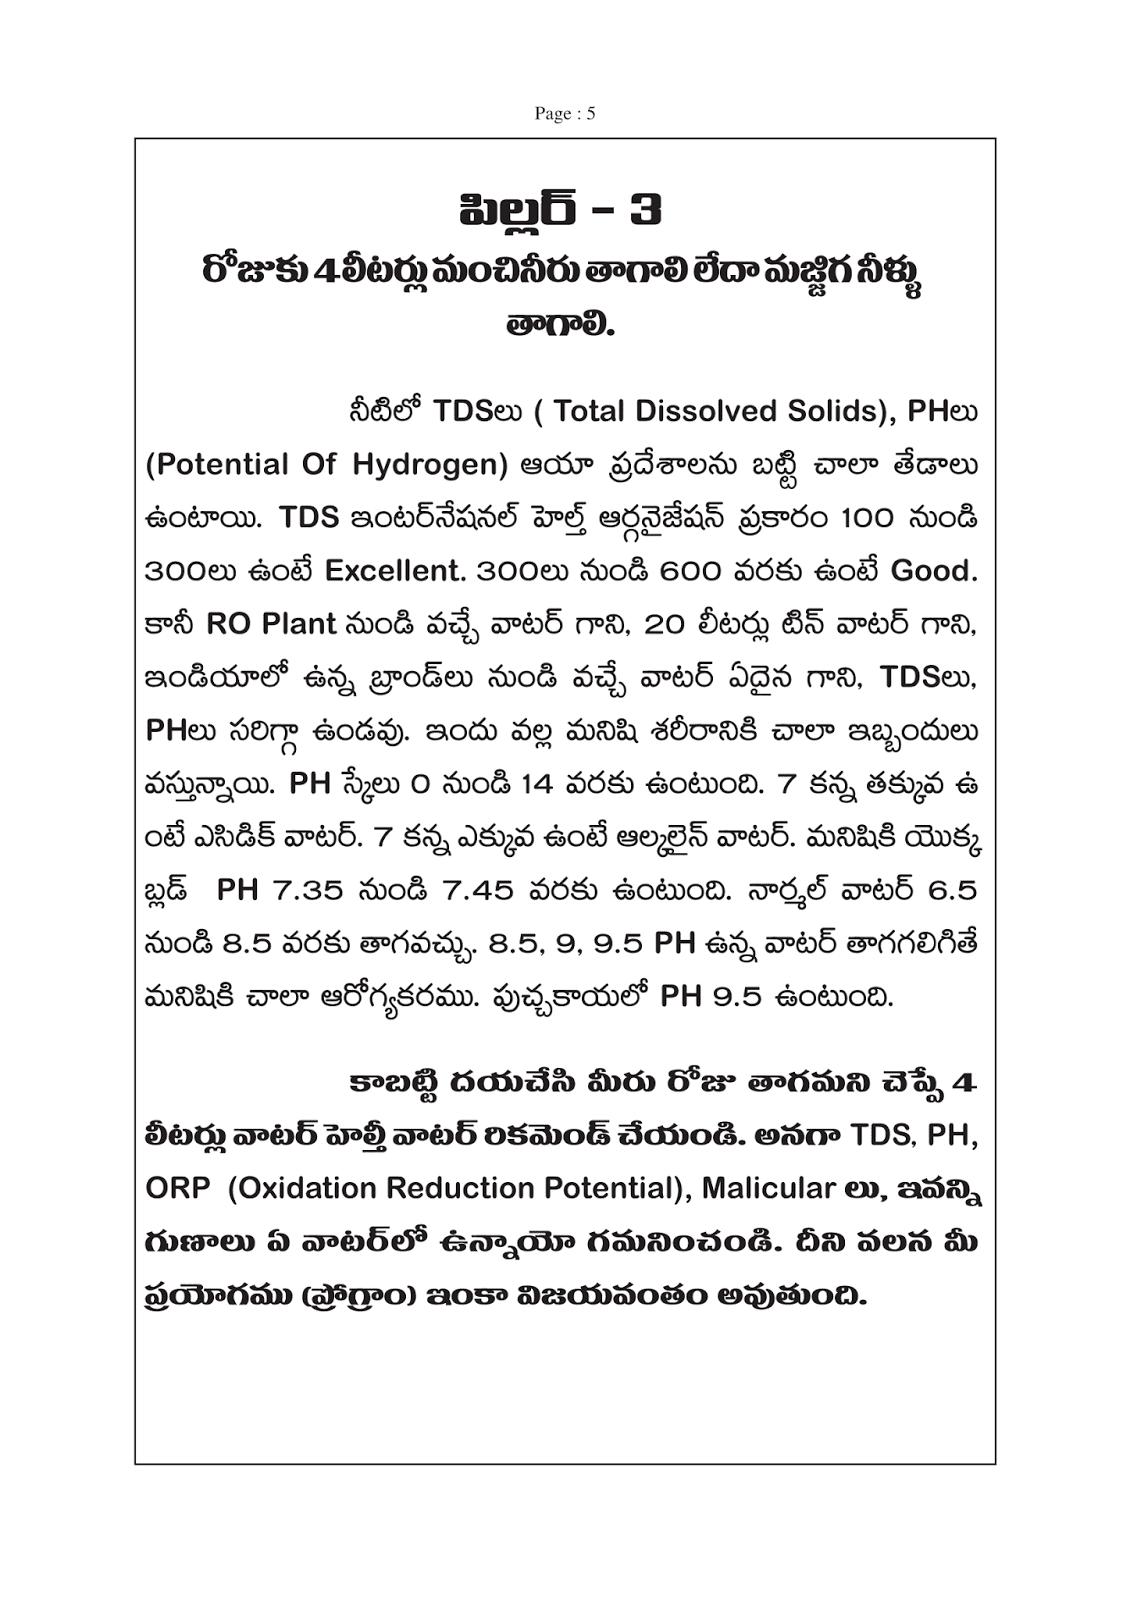 Veeramachaneni Ramakrishna Diet Program Pillar 3 in Telugu ...